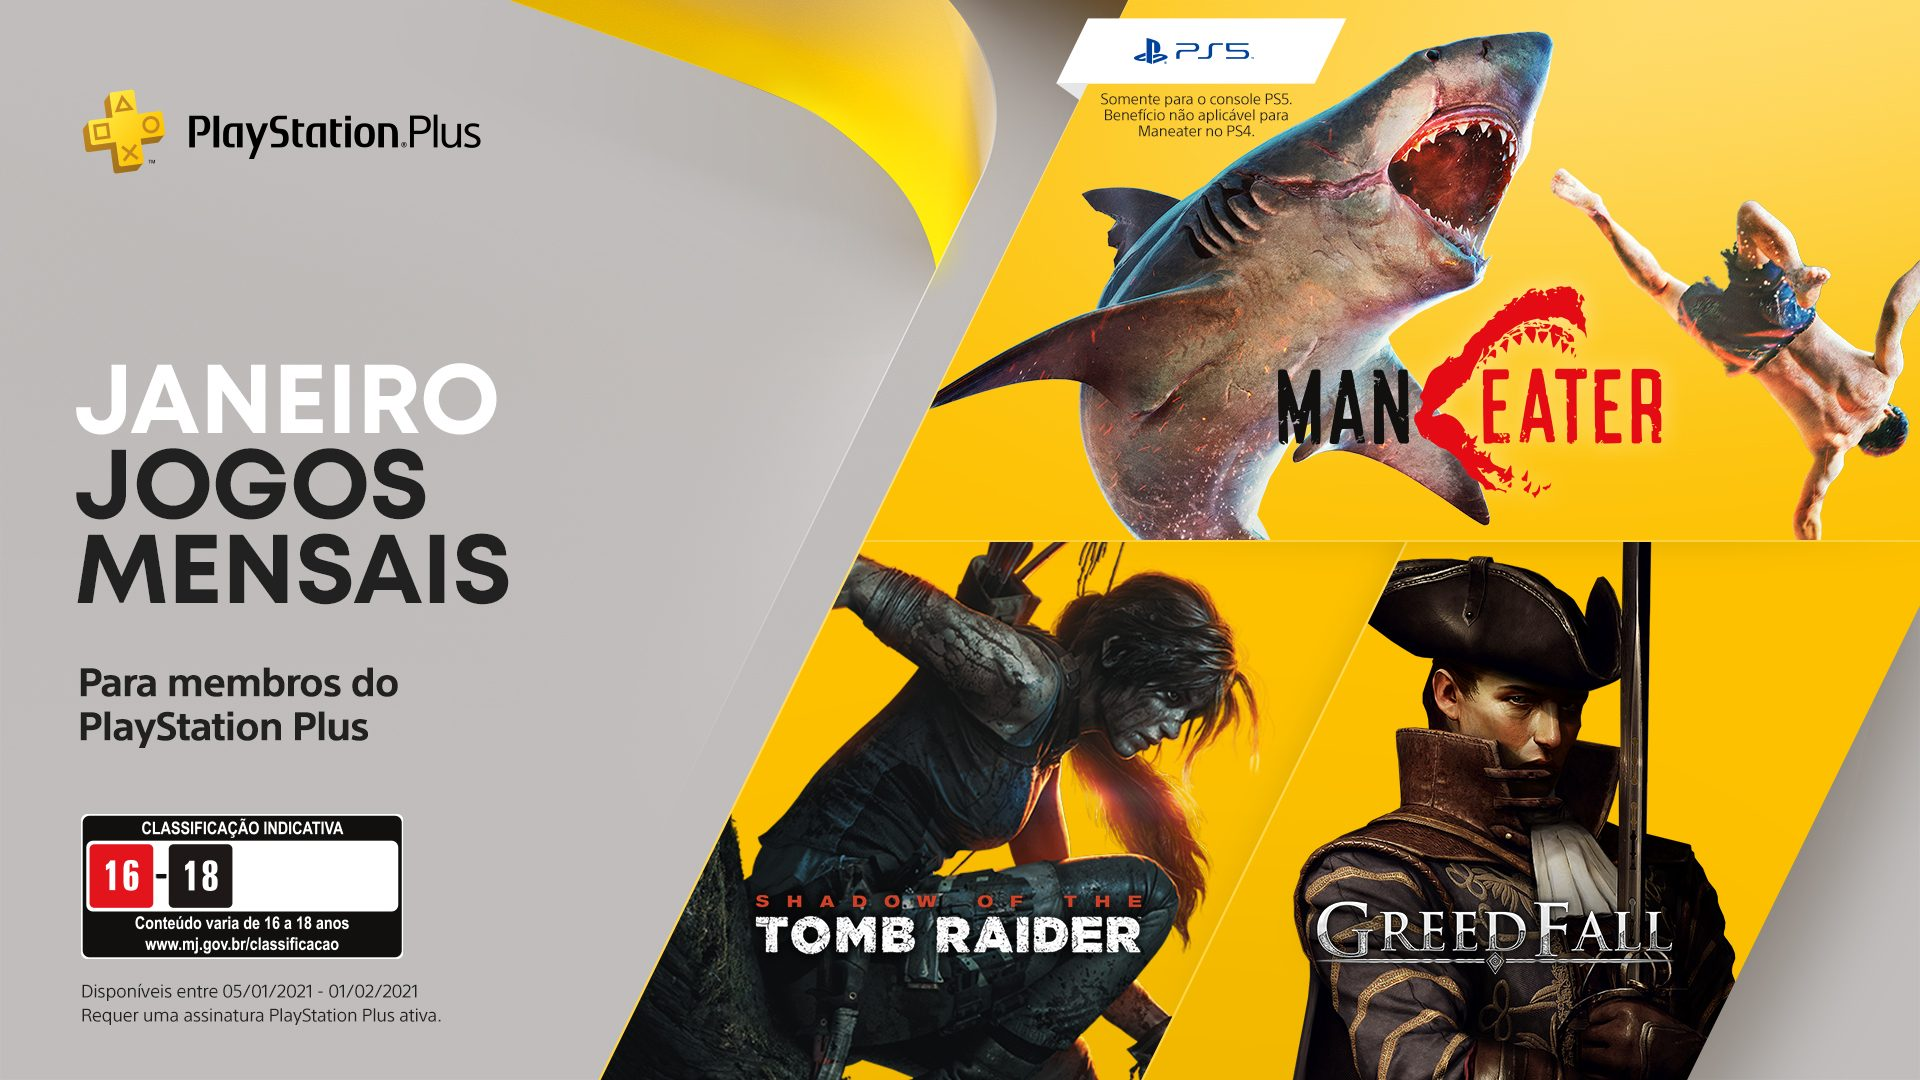 Jogos grátis para assinantes: Maneater, Shadow  of the Tomb Raider e Greedfall.